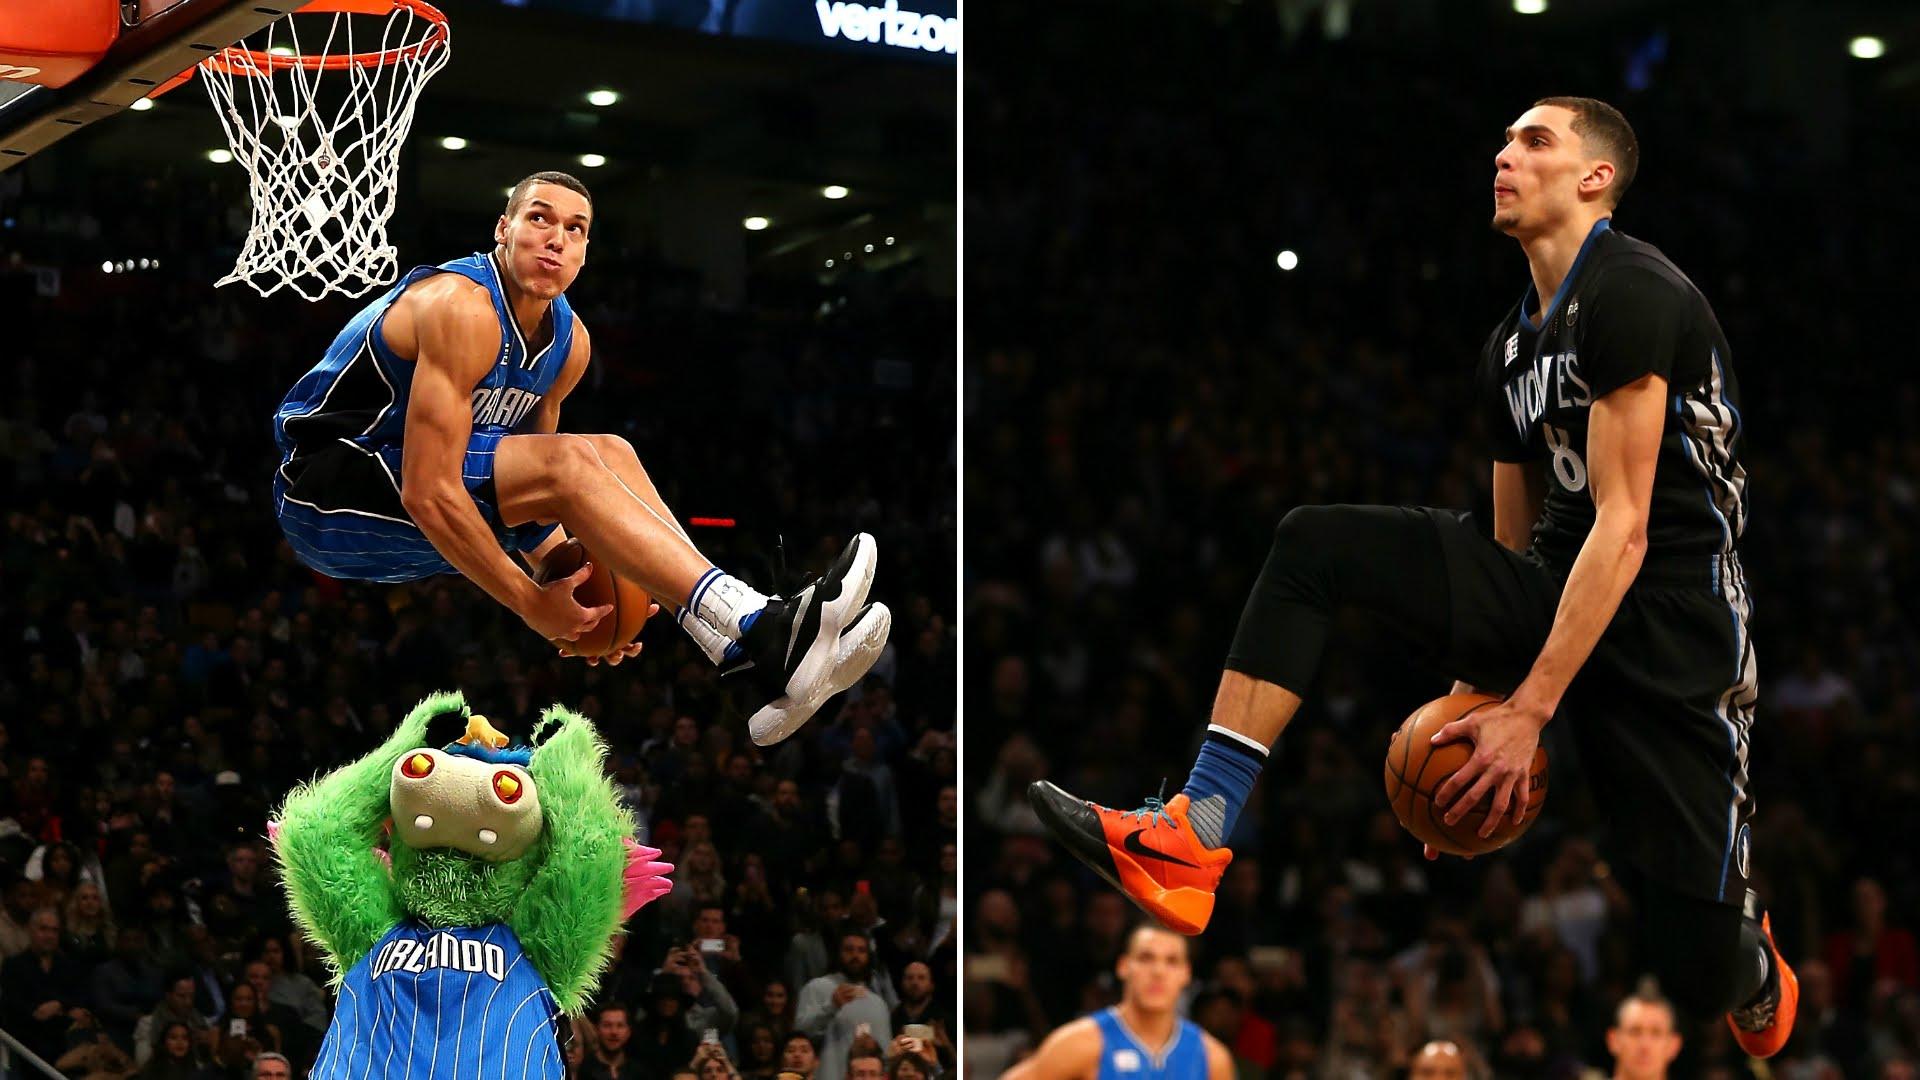 Aaron Gordon & Zach LaVine's Sick Dunks At The 2016 Slam Dunk Contest